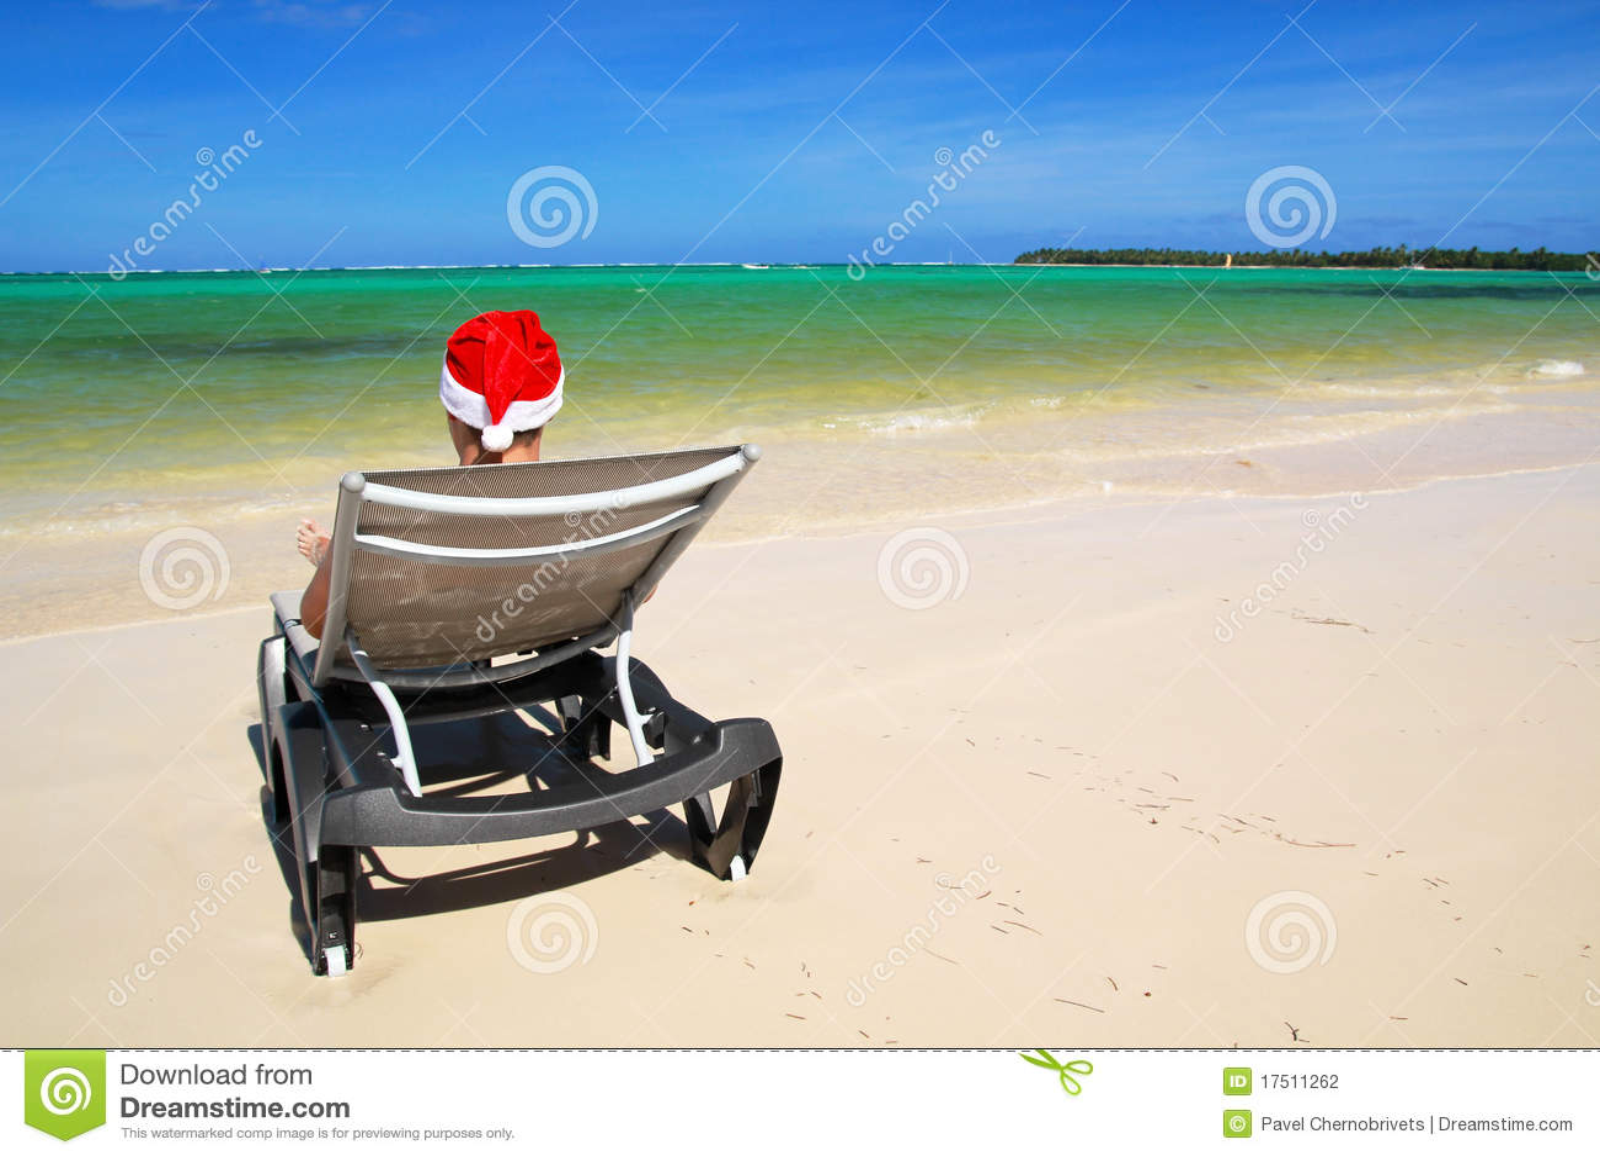 Santa on chaise longue on beach stock photography image for Beach chaise longue